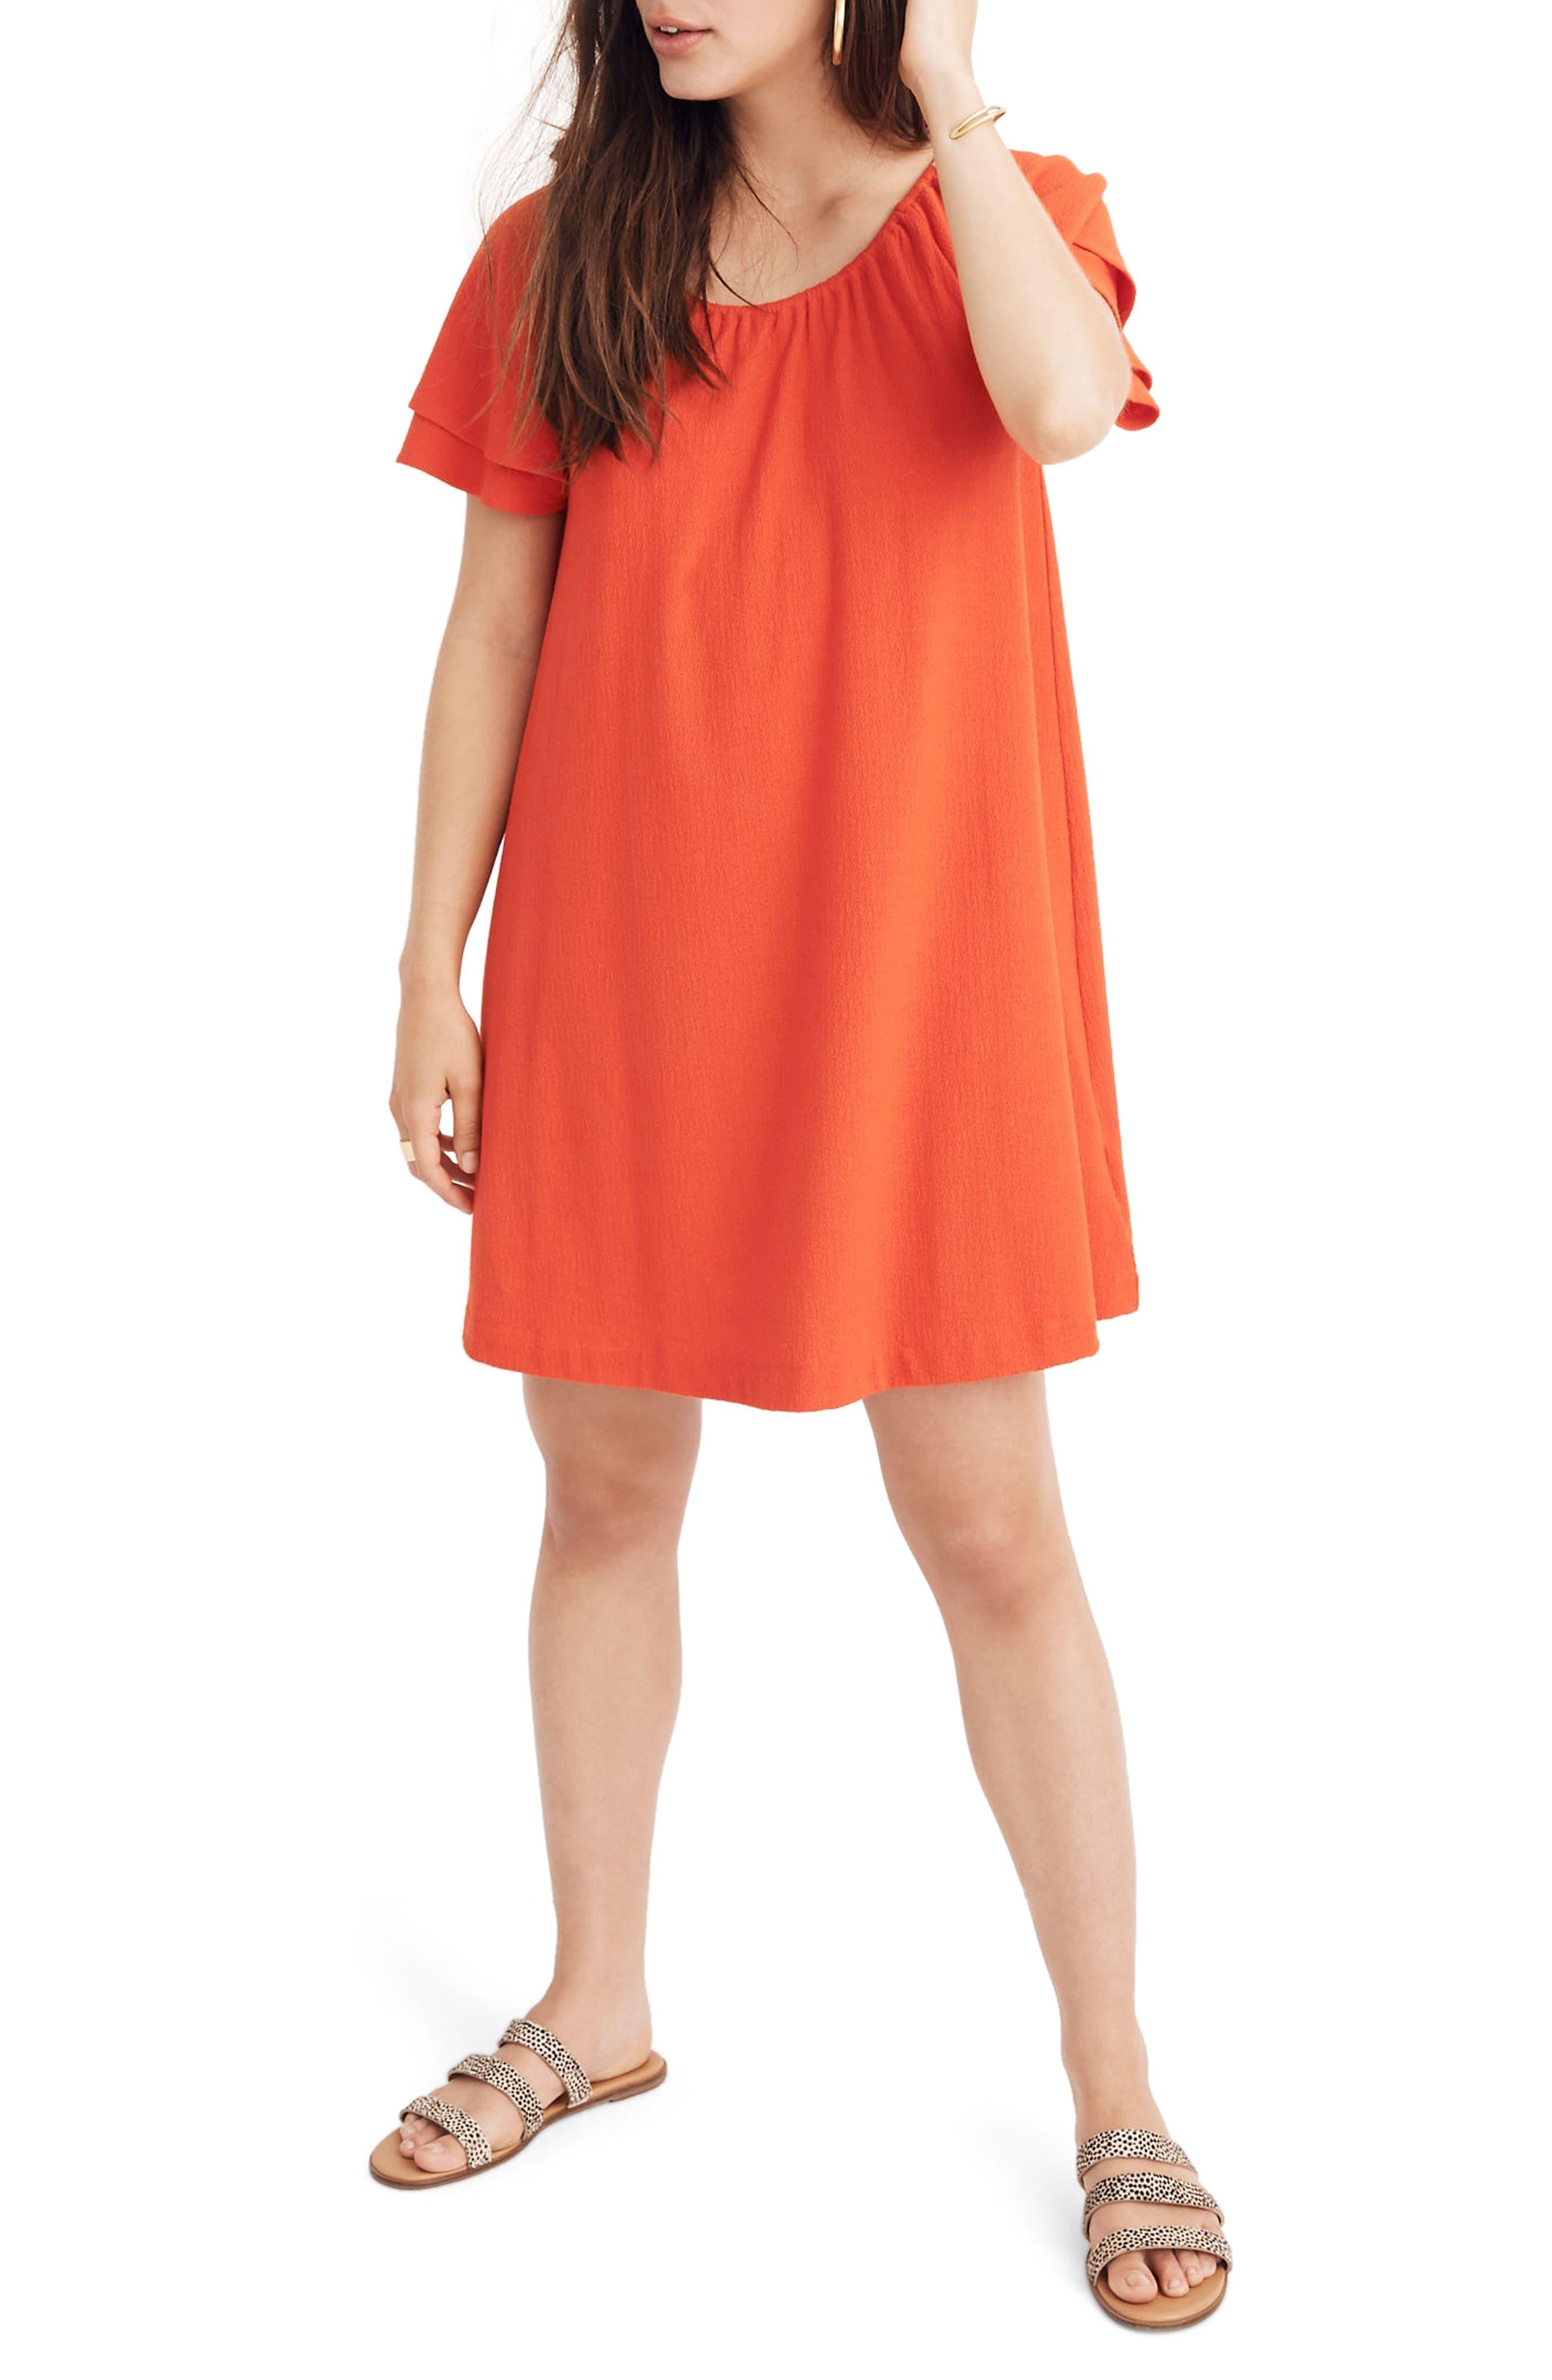 Madewell Texture & Thread Tiered Sleeve Dress, Red